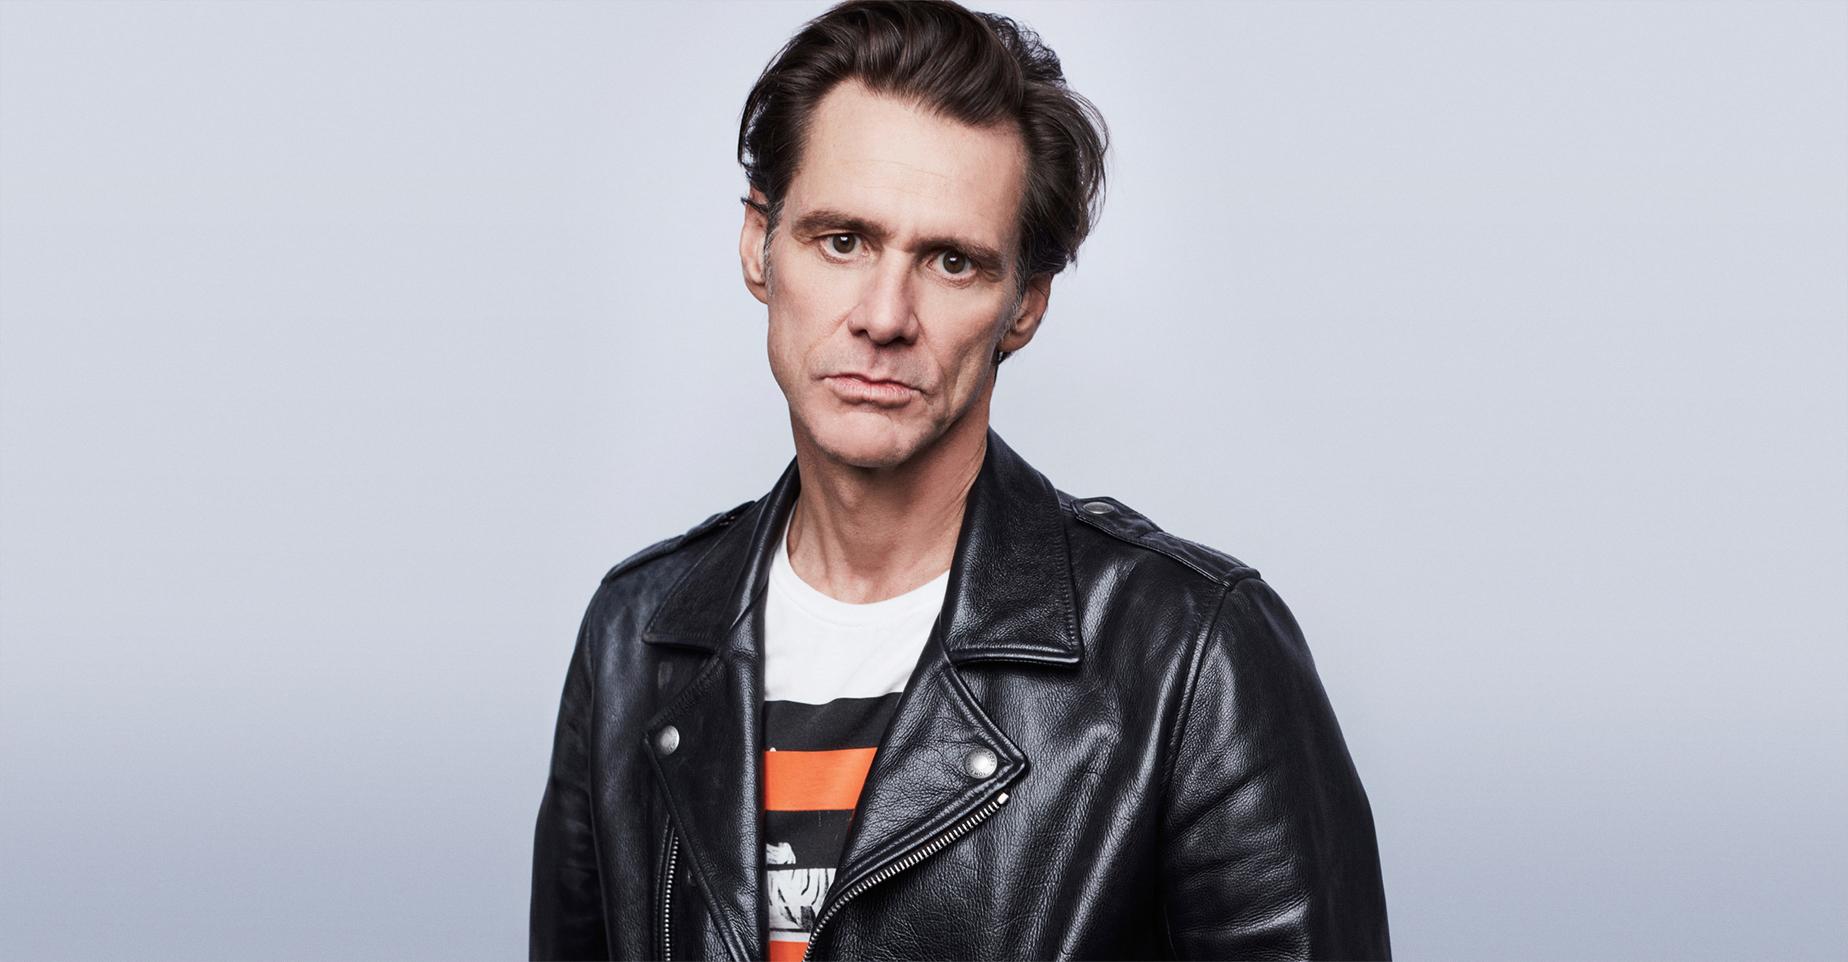 Jim-Carrey-01.jpg